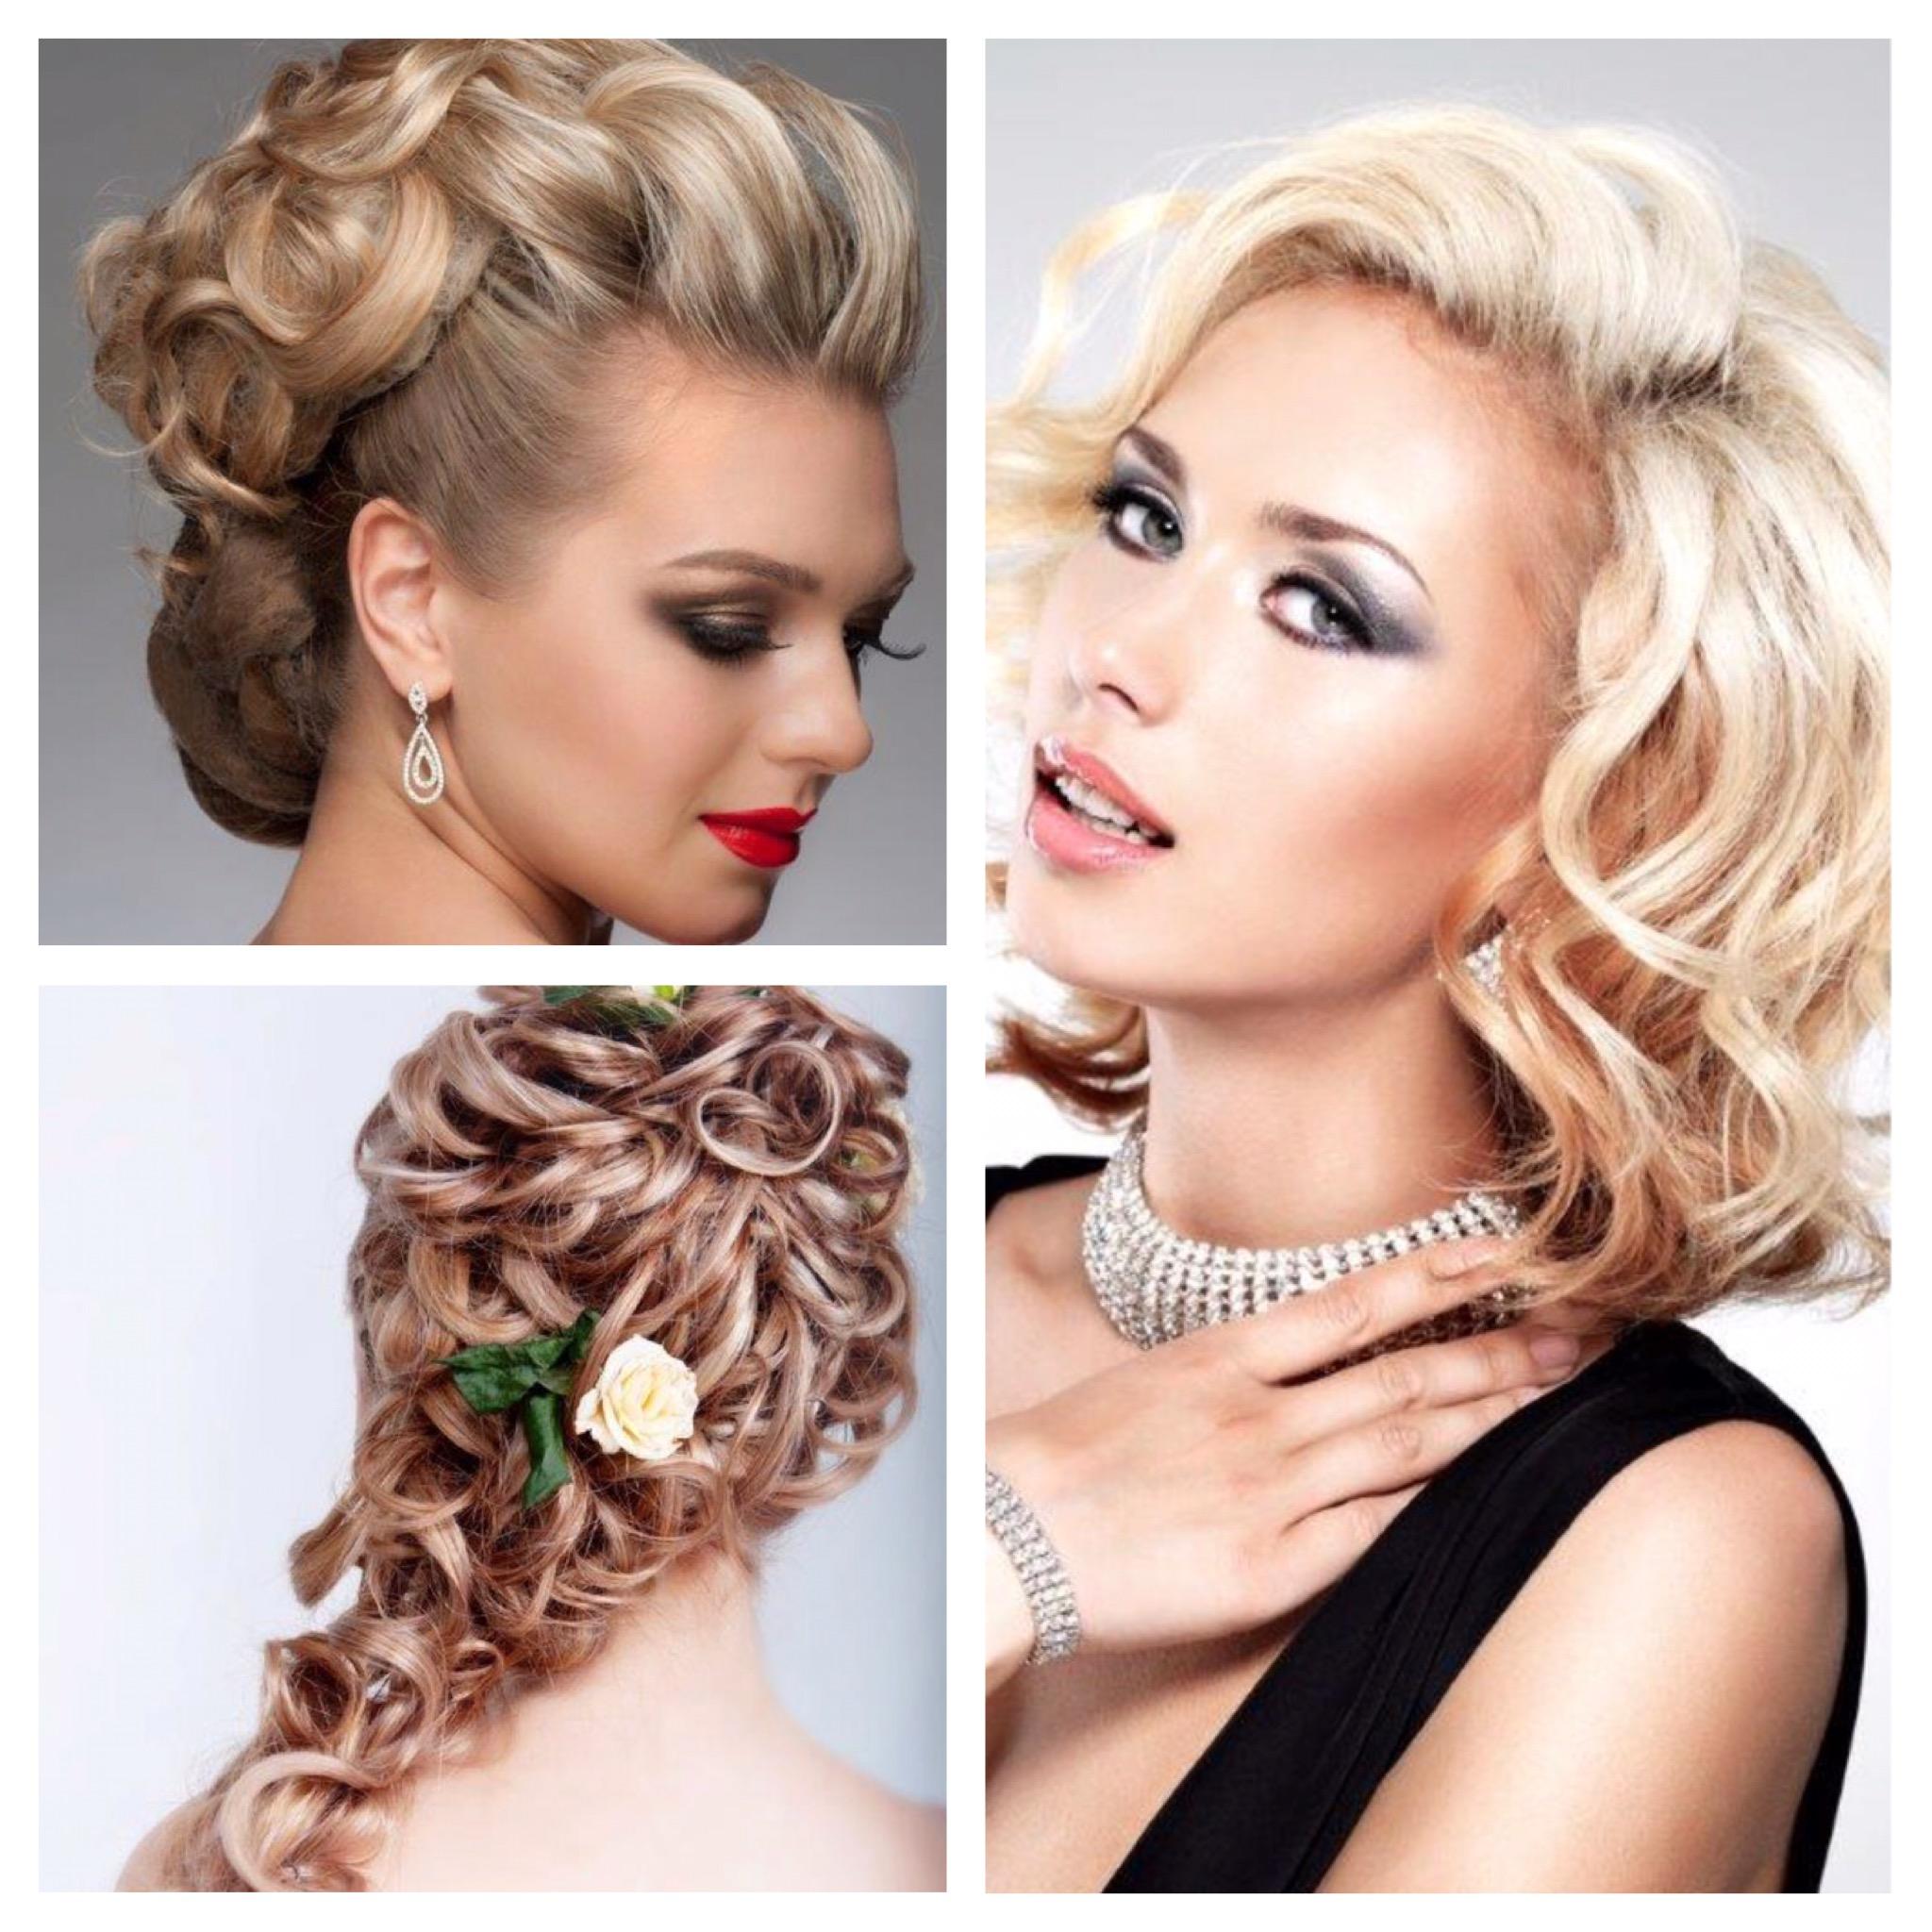 Updo ball season hair